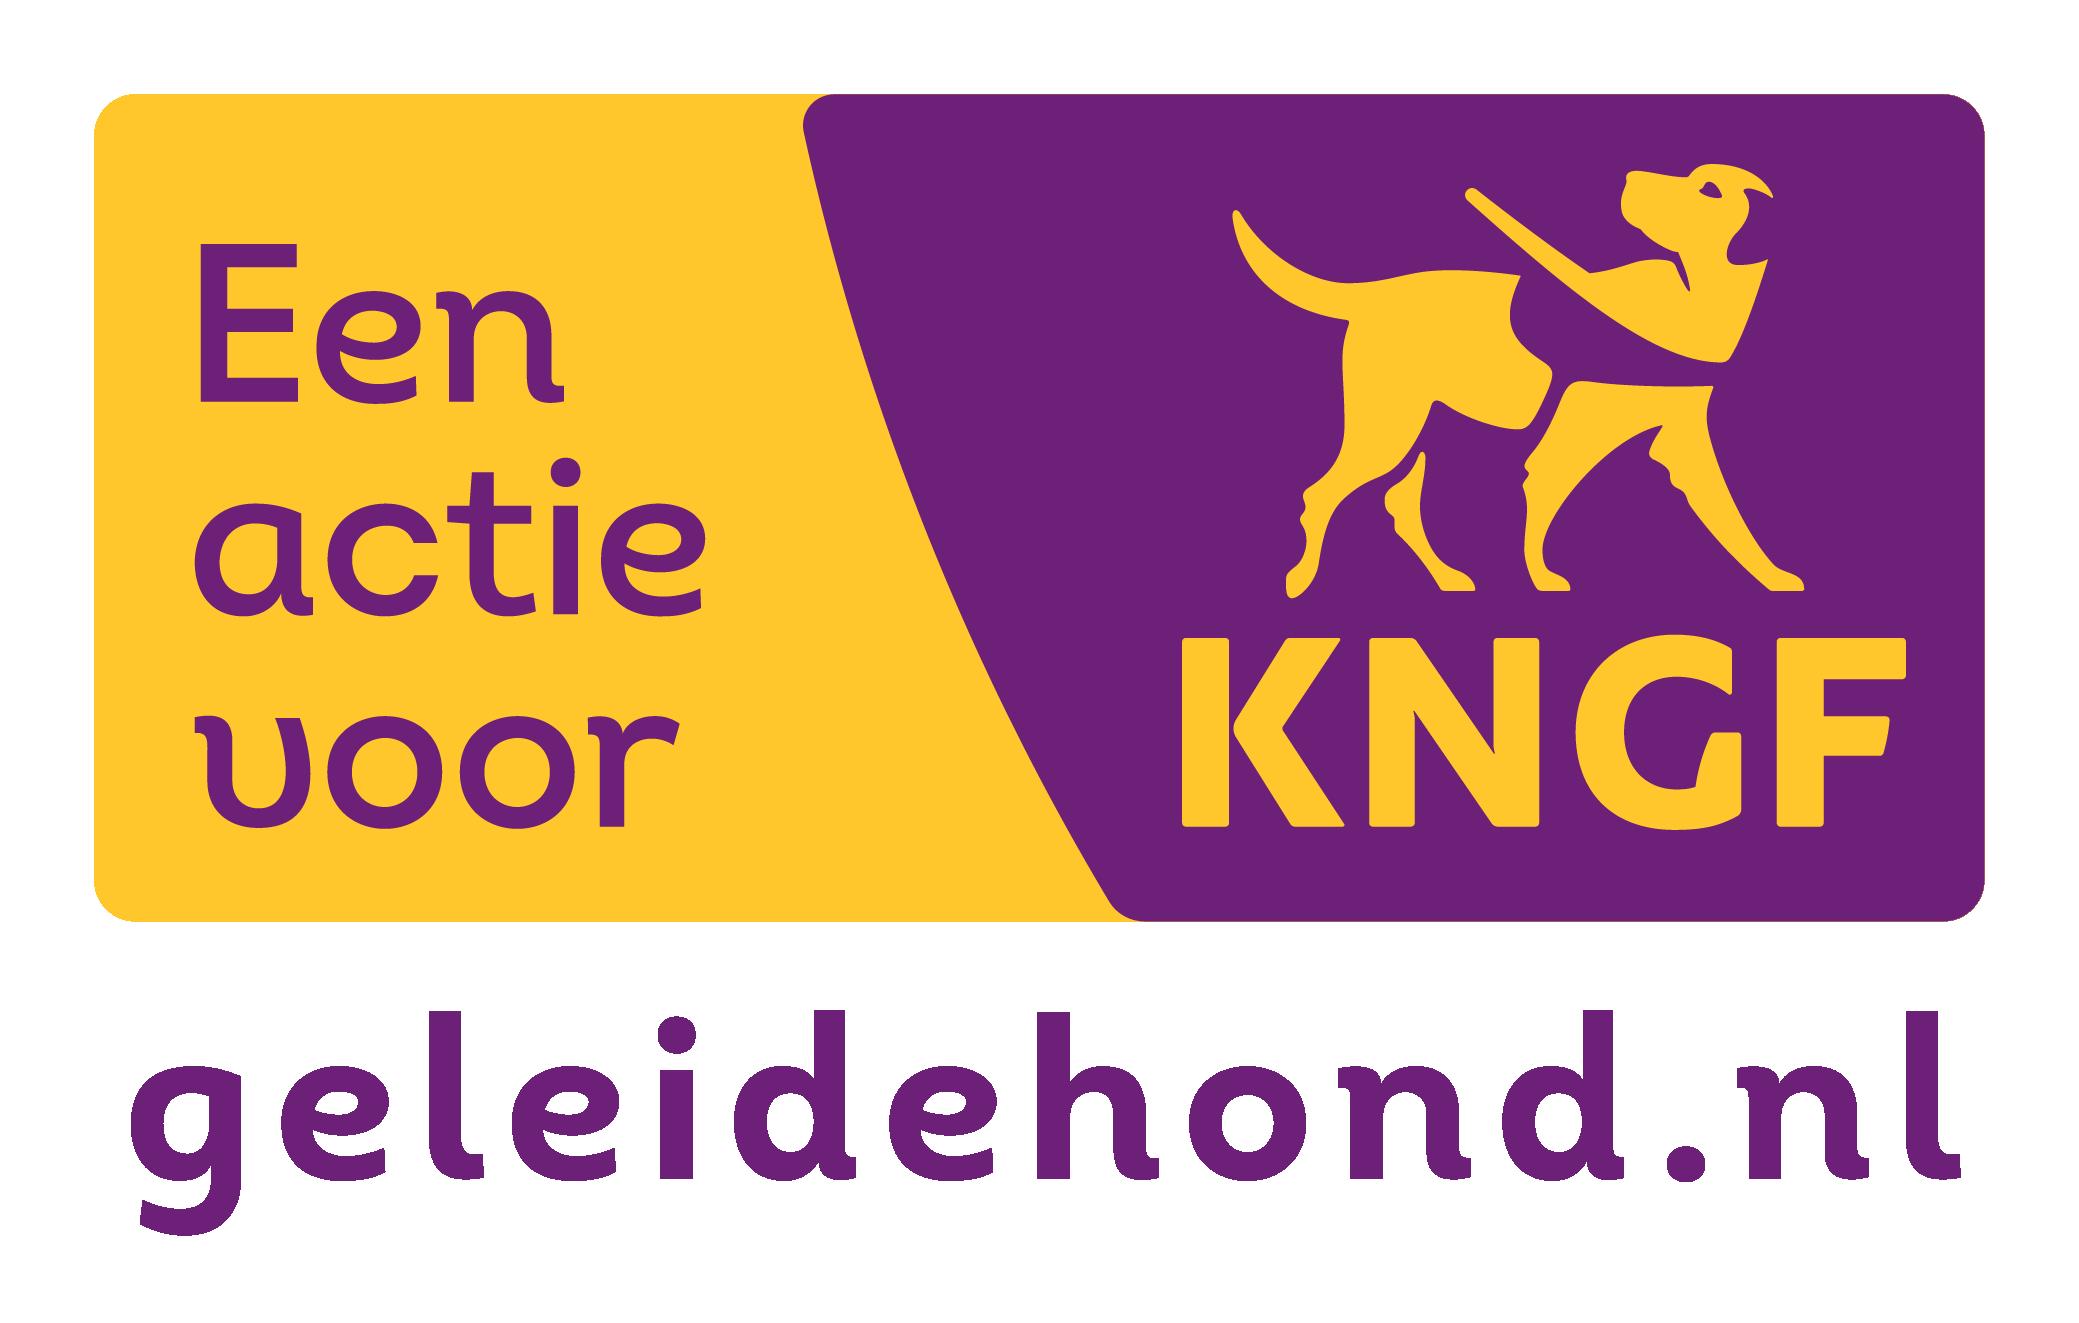 KNGF geleidehond